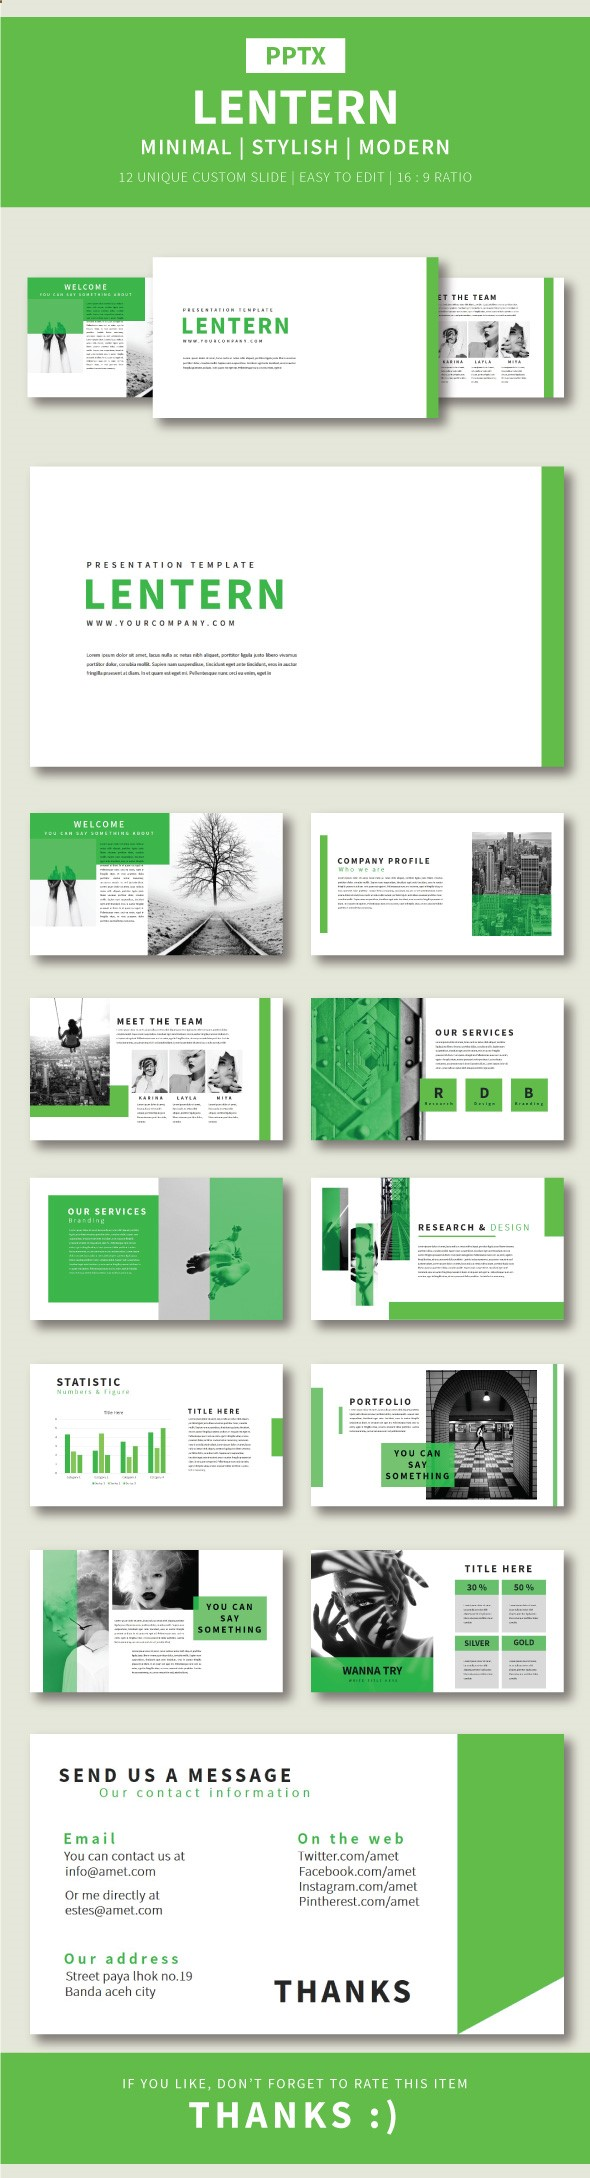 Lentern Pptx Template | Porters | Pinterest | Pagina web y Paisajismo